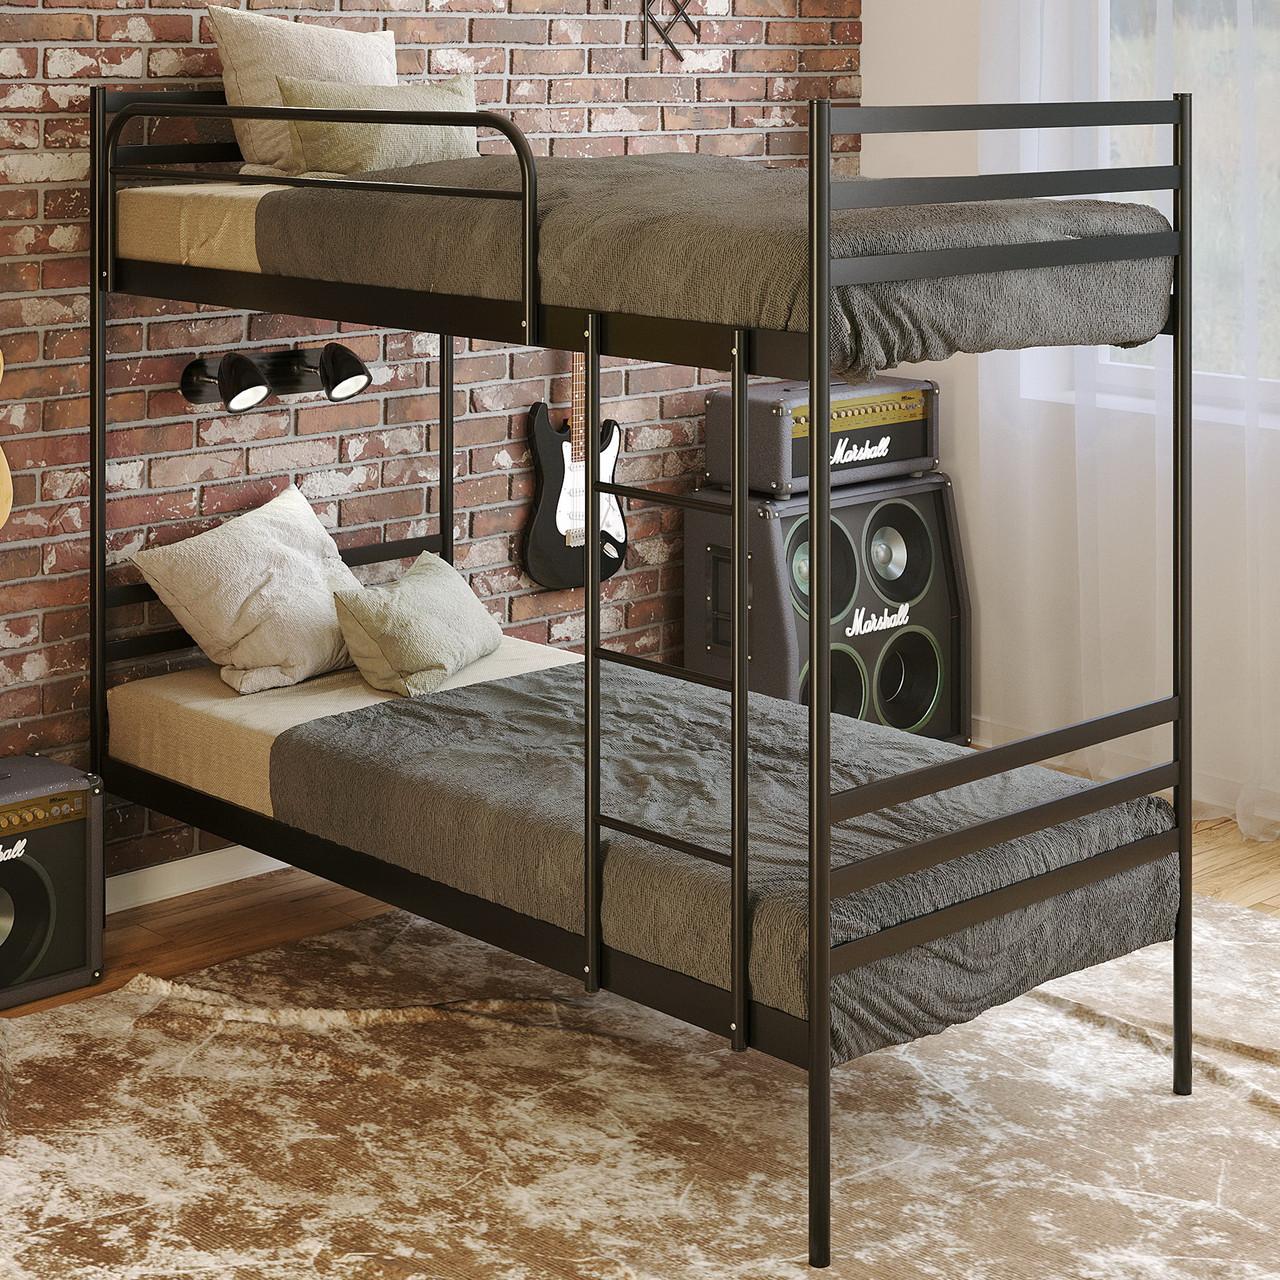 "Кровать двухъярусная ""Оптима Дуо"" 90х200 см. 1 перило, Металл"